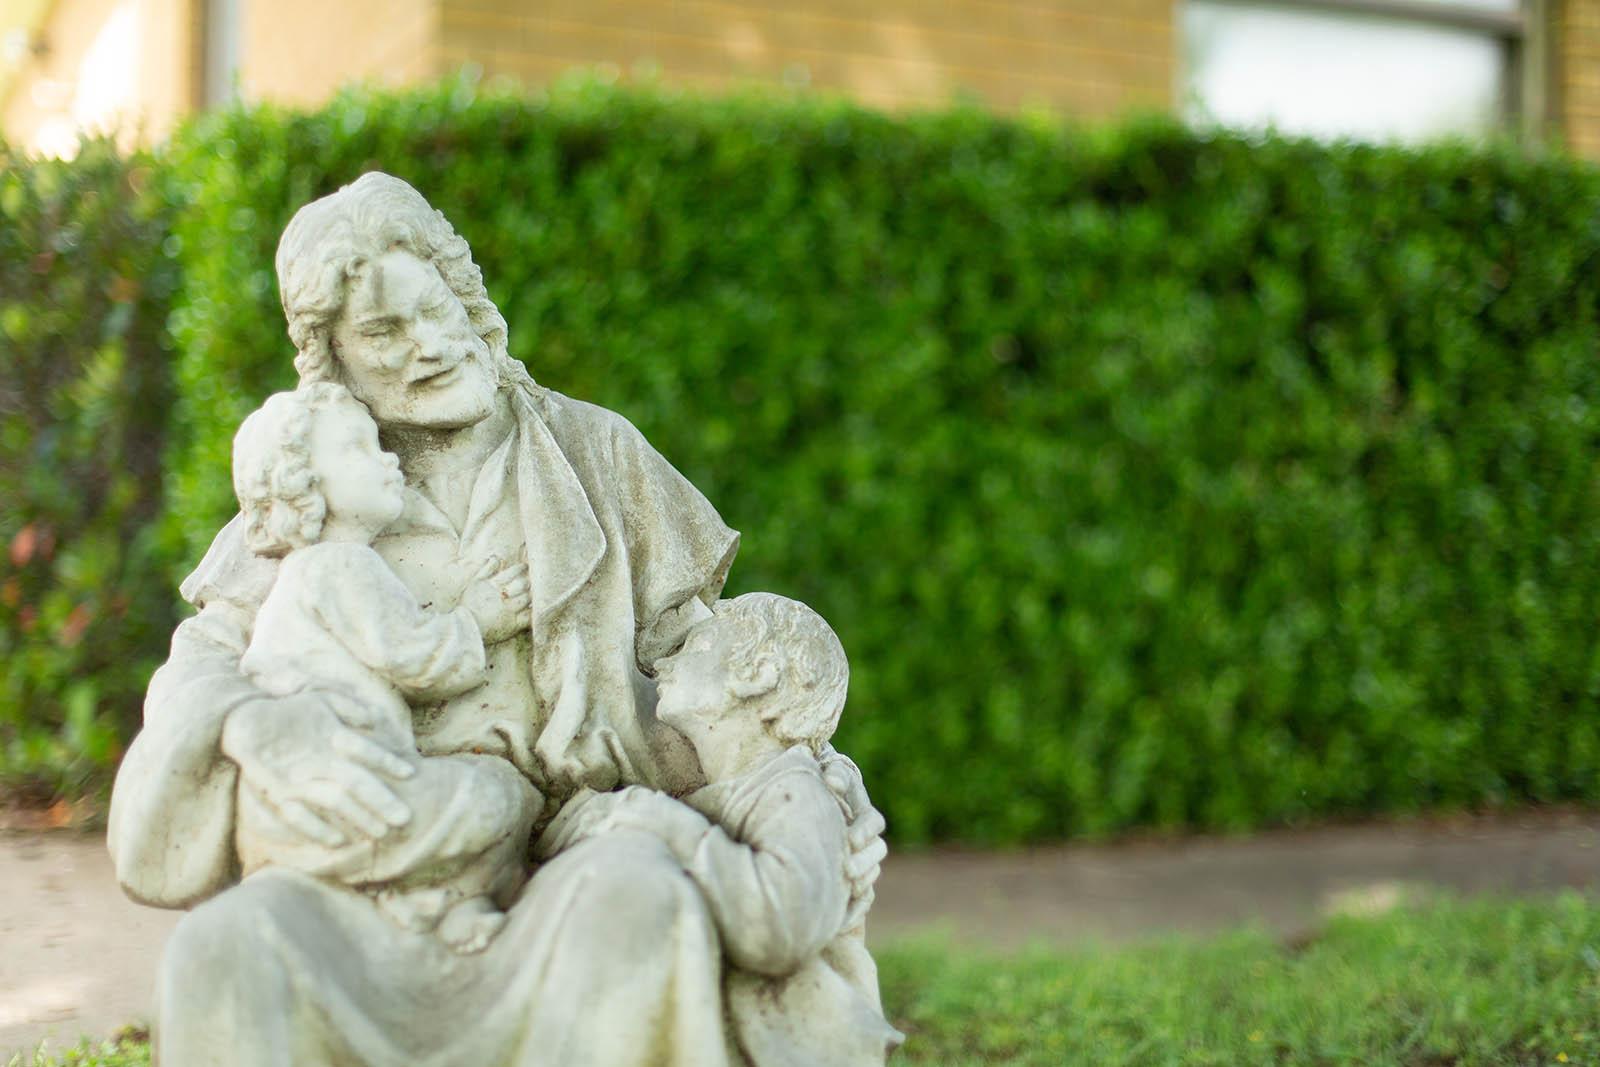 Statue of Jesus with 2 children